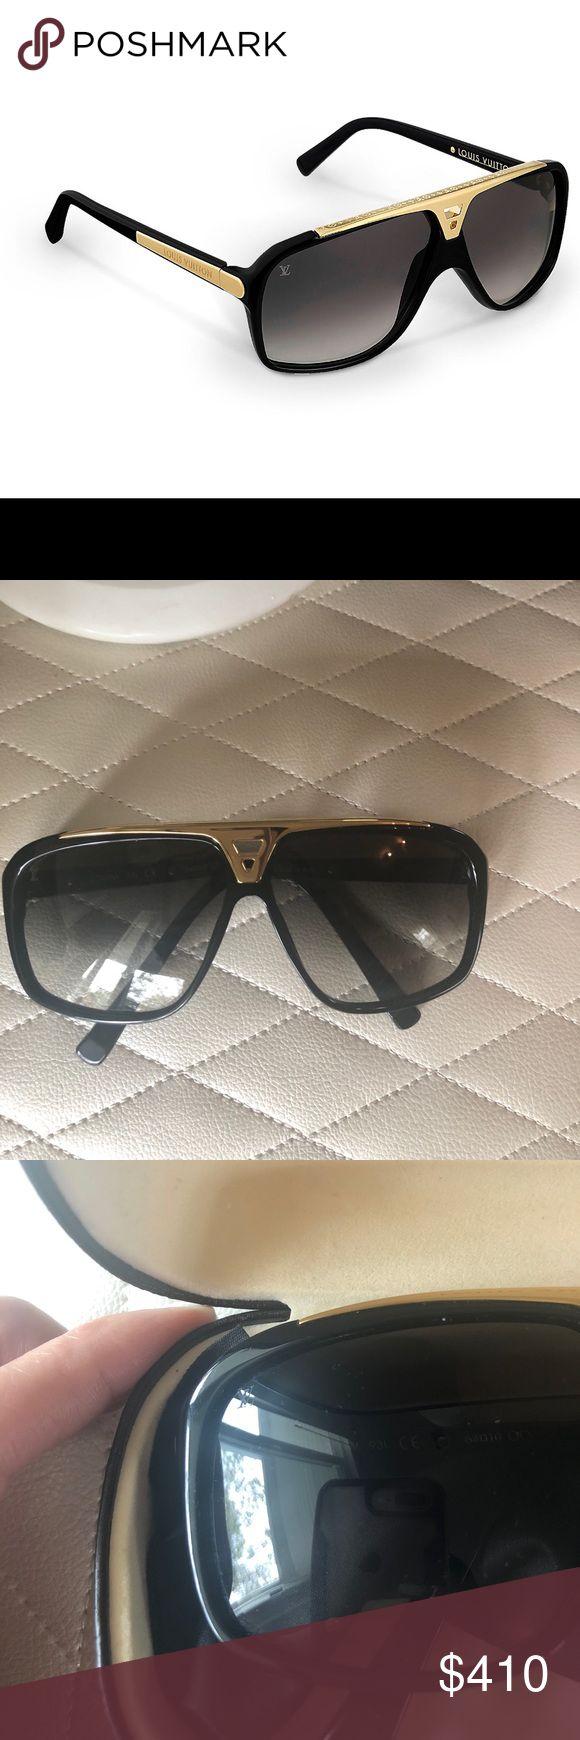 Louis Vuitton men's sunglasses worn once 100% authentic like a new Louis Vuitton Accessories Sunglasses